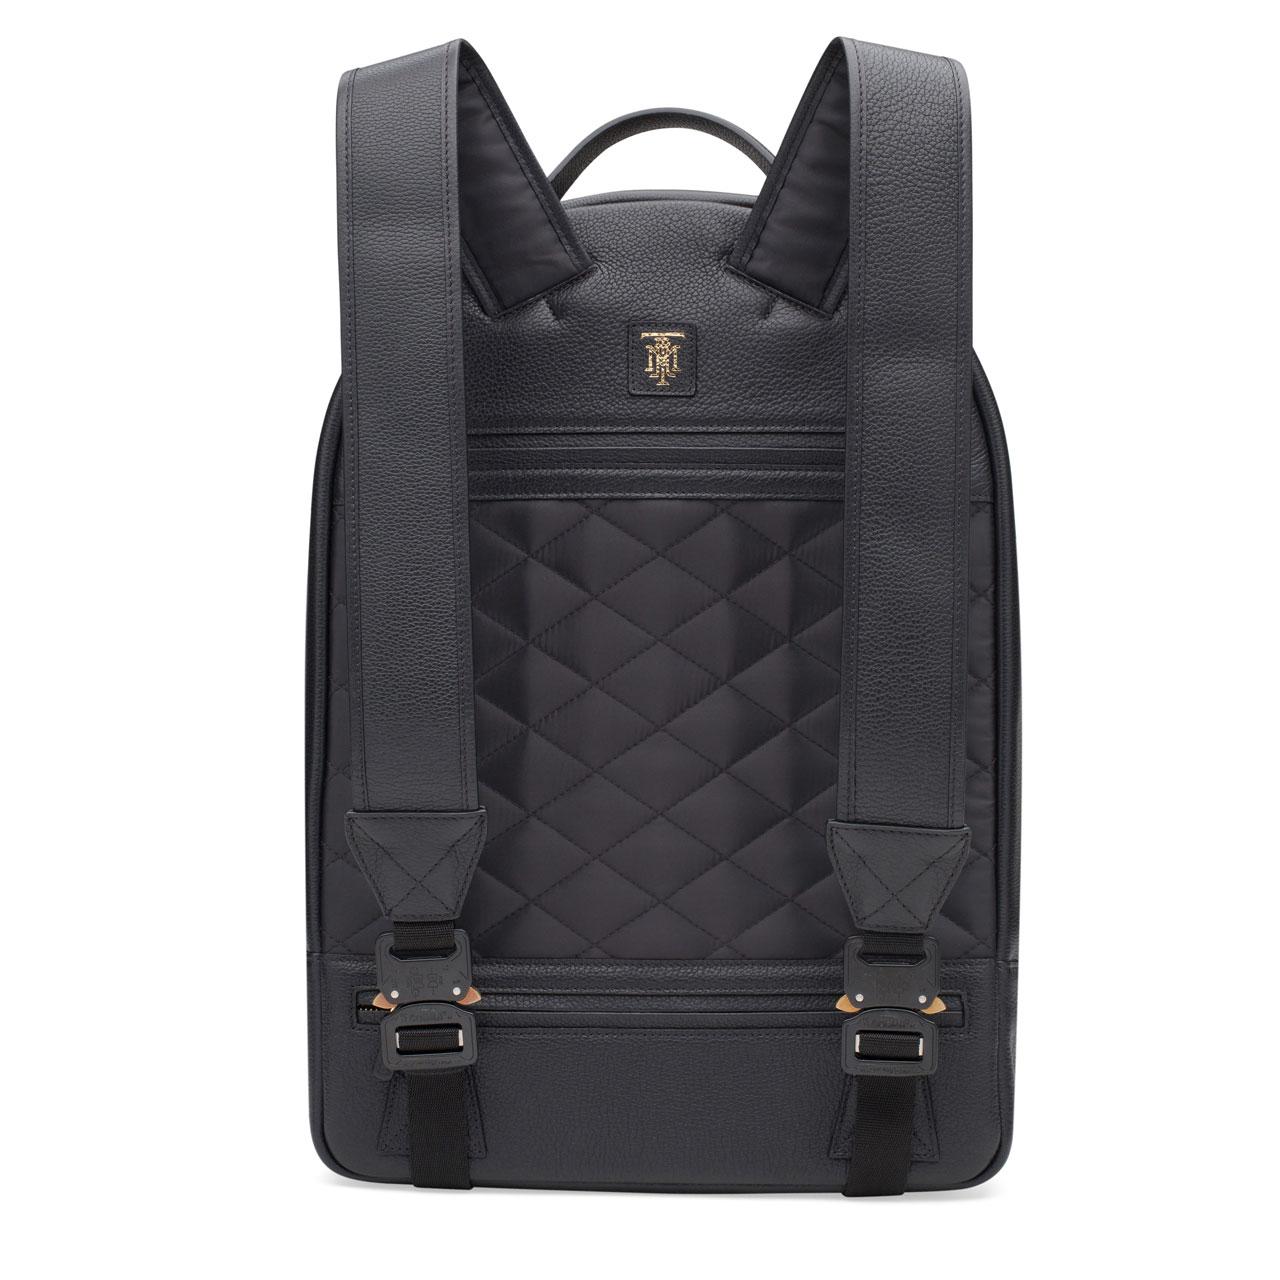 Nomad backpack byMontroi.